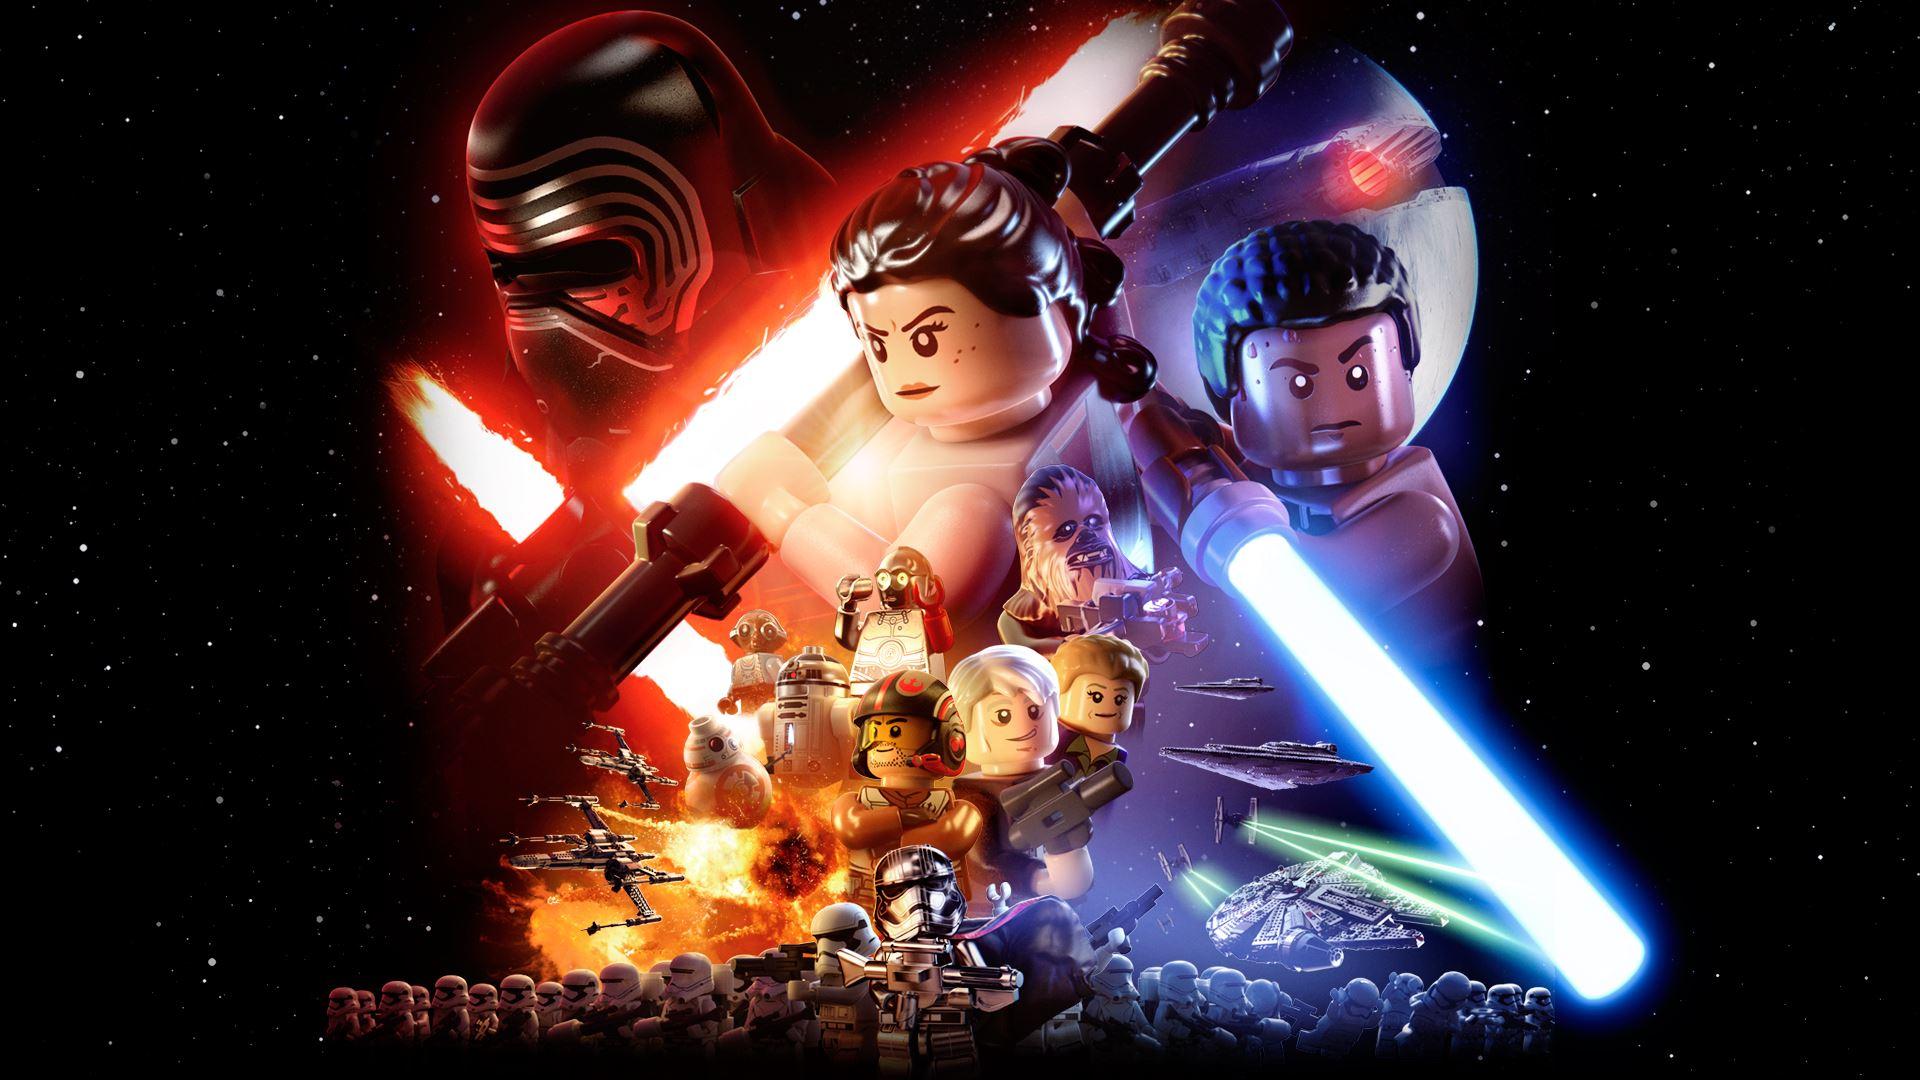 U0027Star Wars: The Force Awakensu0027 Is Getting A LEGO Video Game